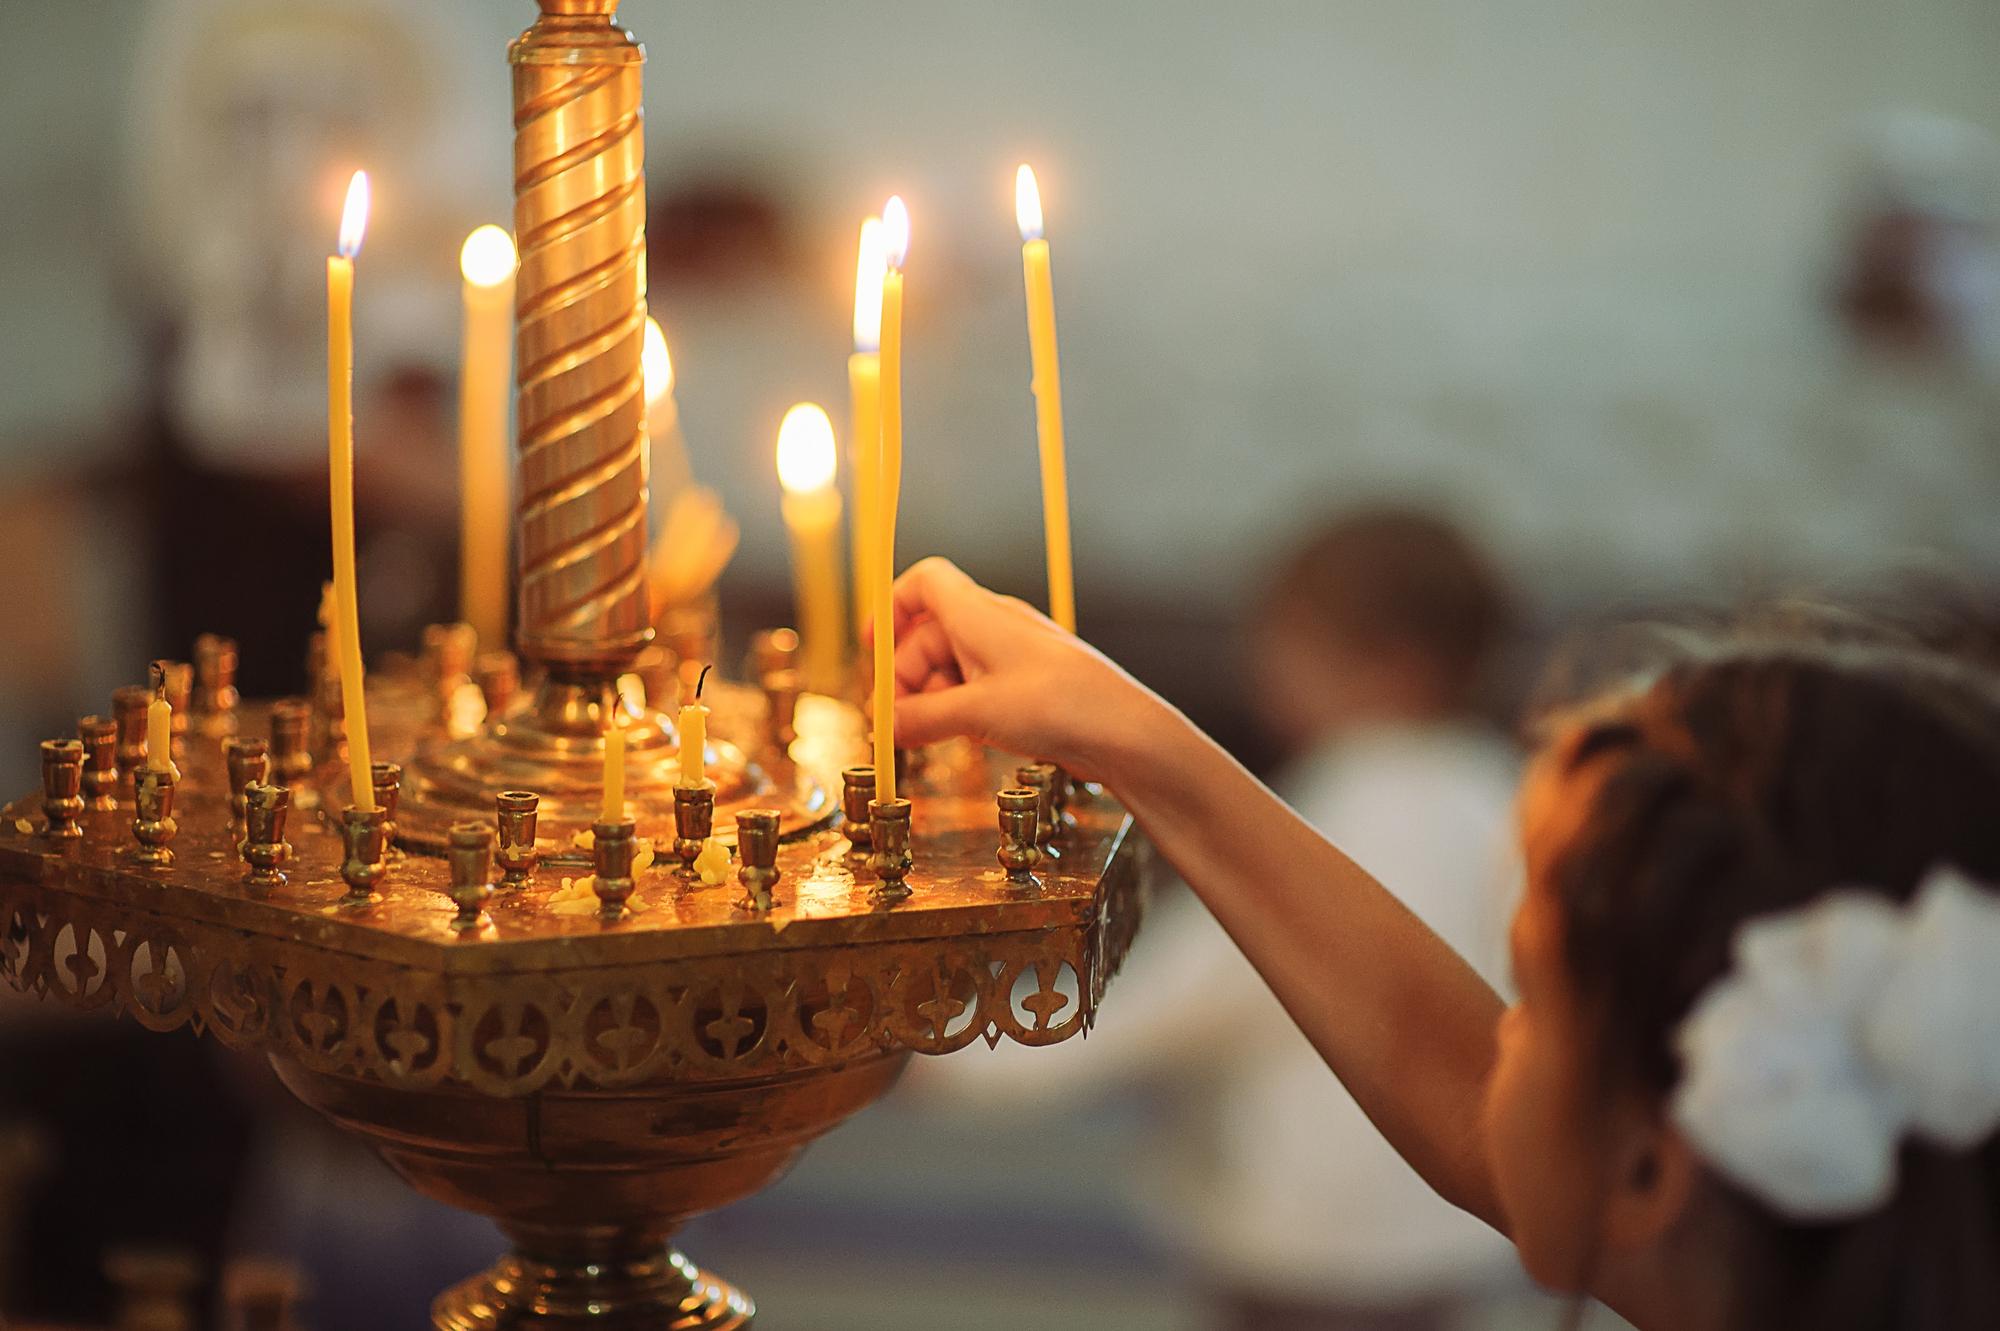 РПЦ не лишила сана осужденного за сутенерство священника